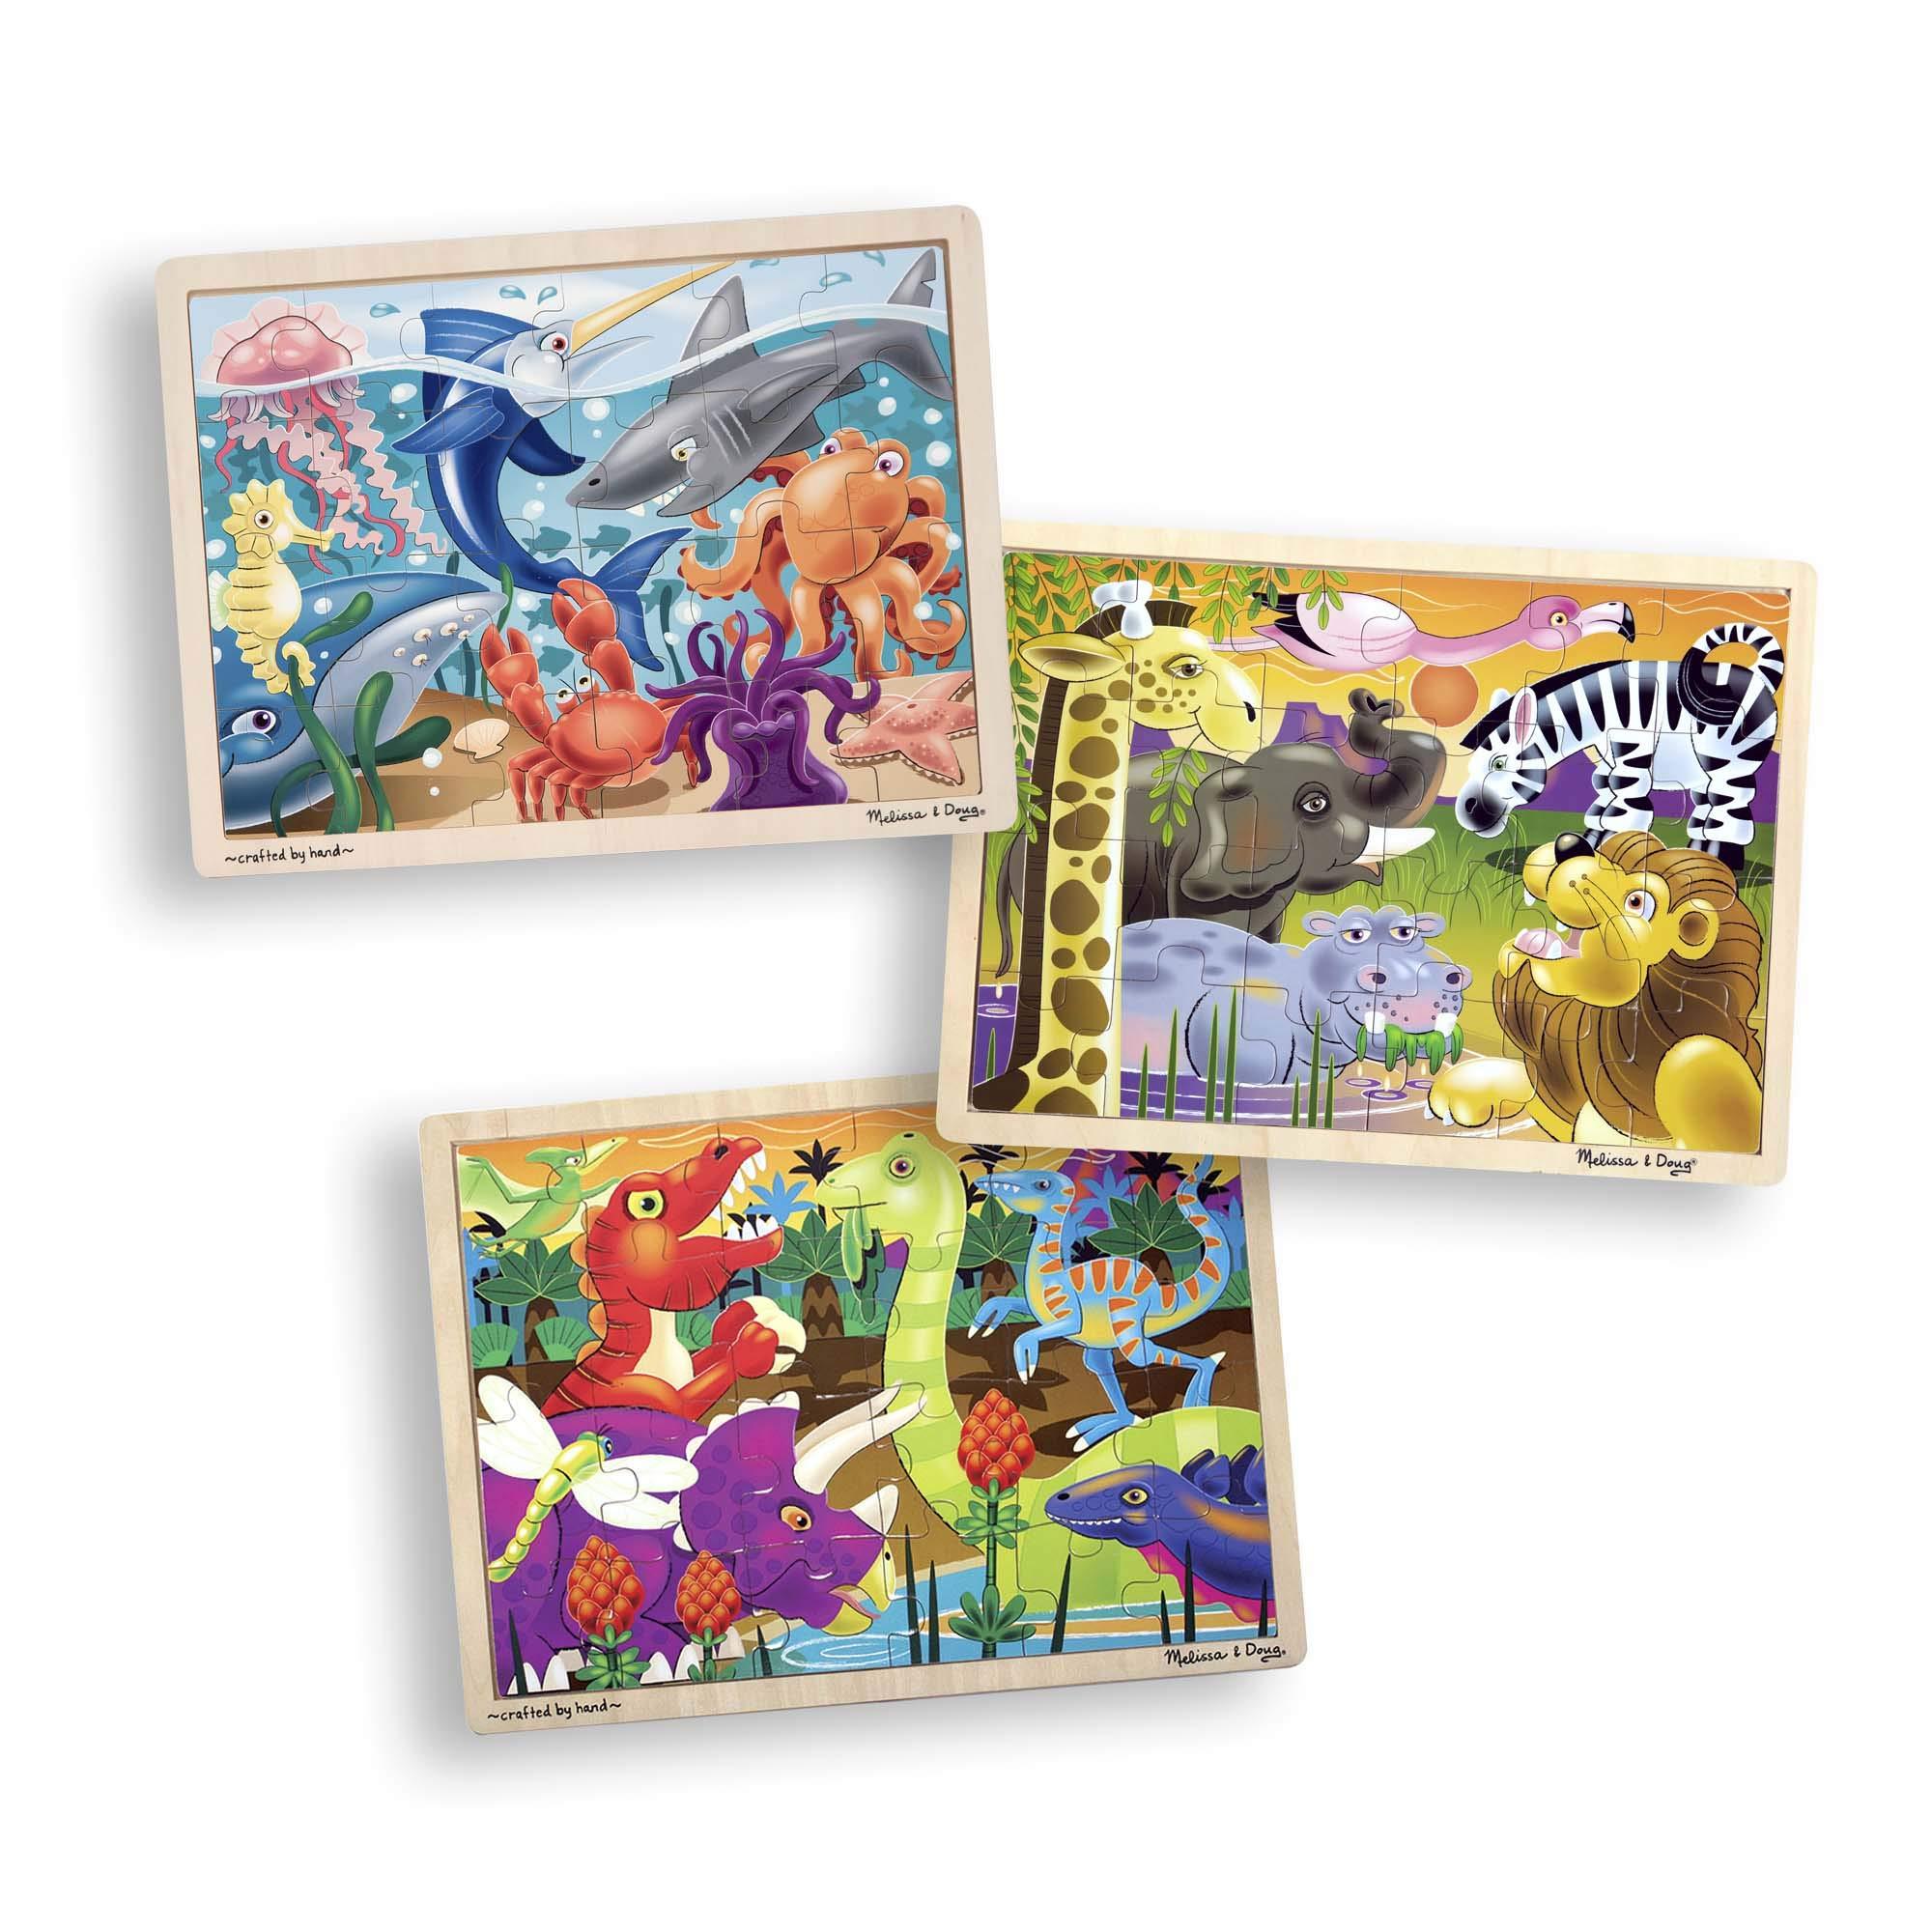 Melissa & Doug 3-Puzzle Wooden Jigsaw Set - Dinosaurs, Ocean, and Safari (24 Pieces Each) by Melissa & Doug